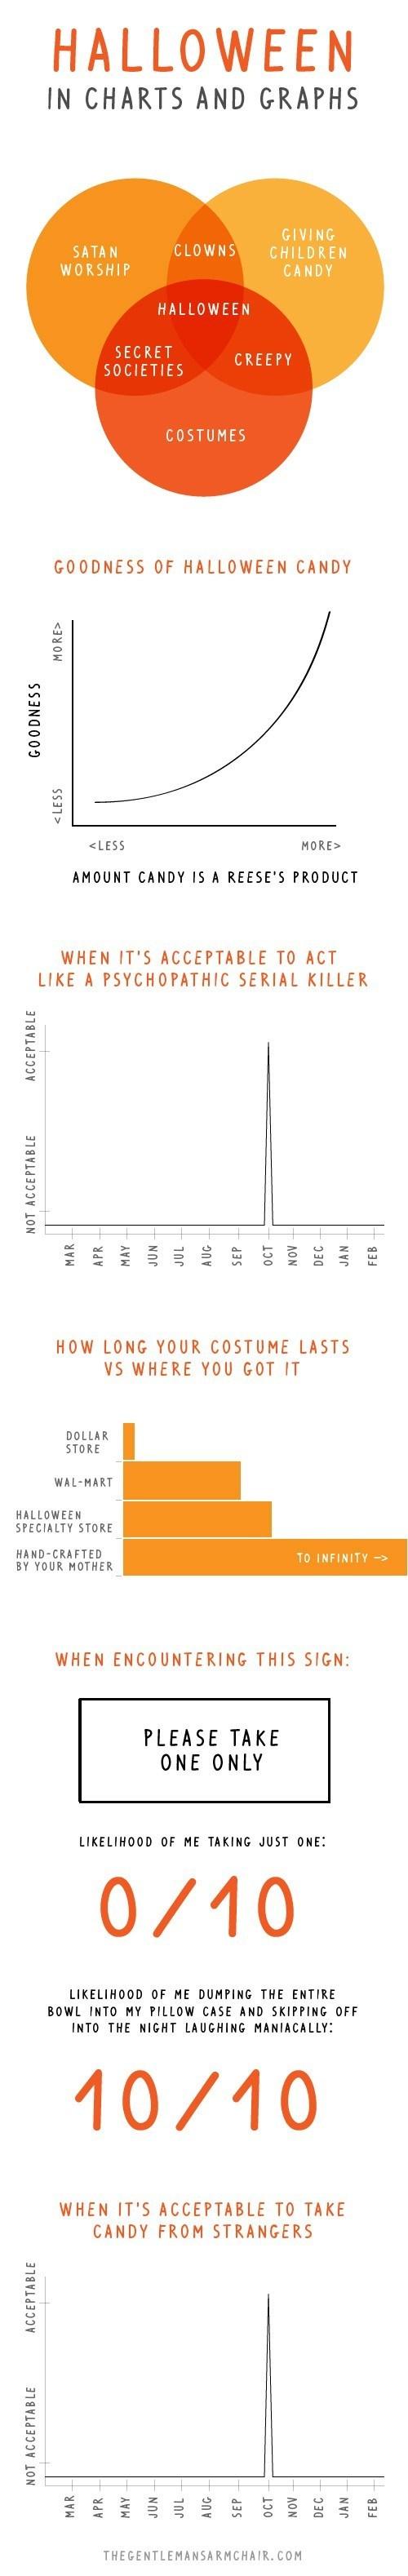 halloween,charts,funny,web comics